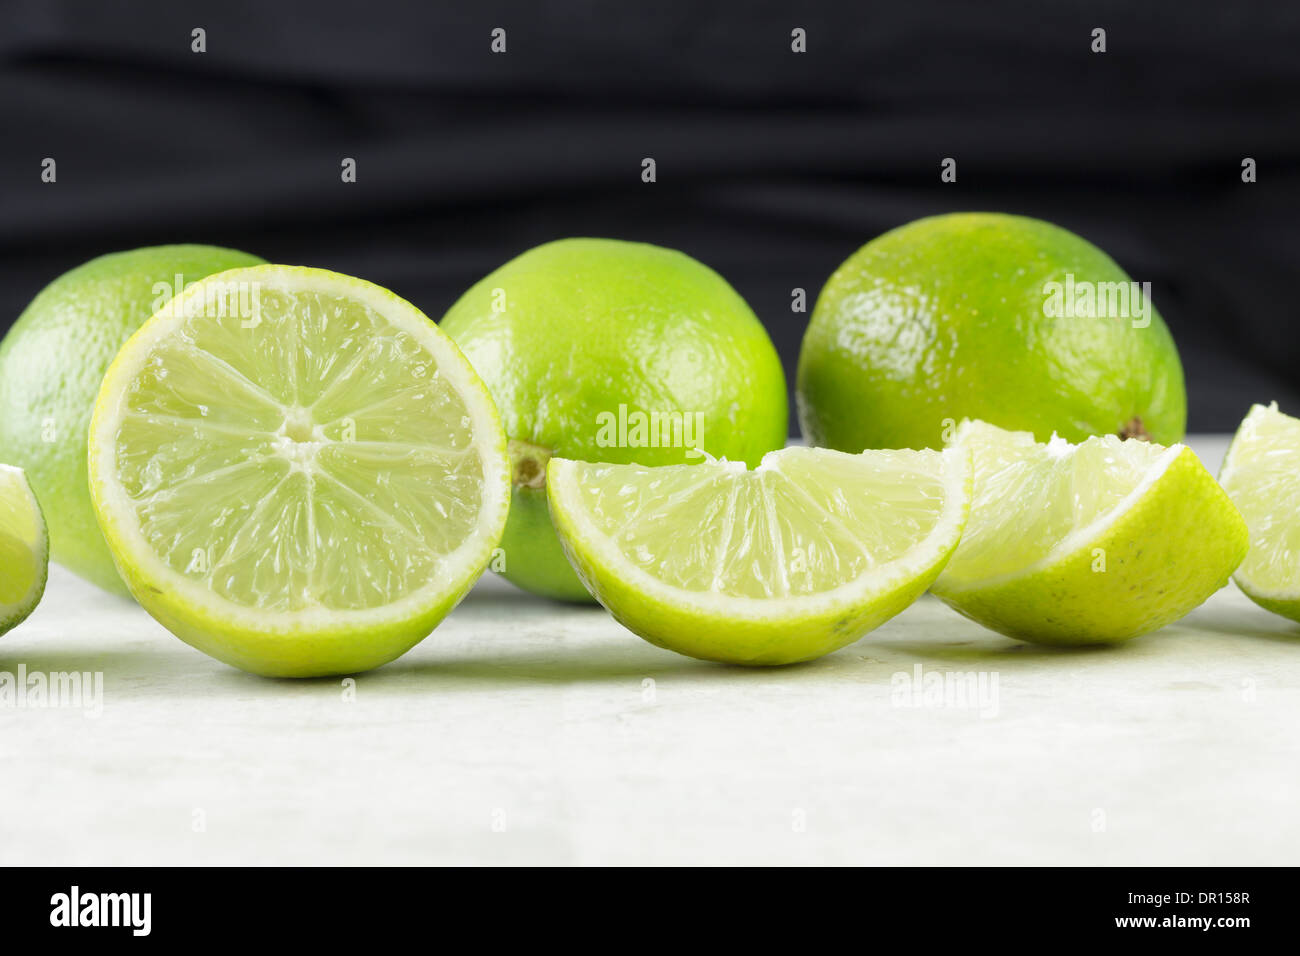 Limes - Stock Image